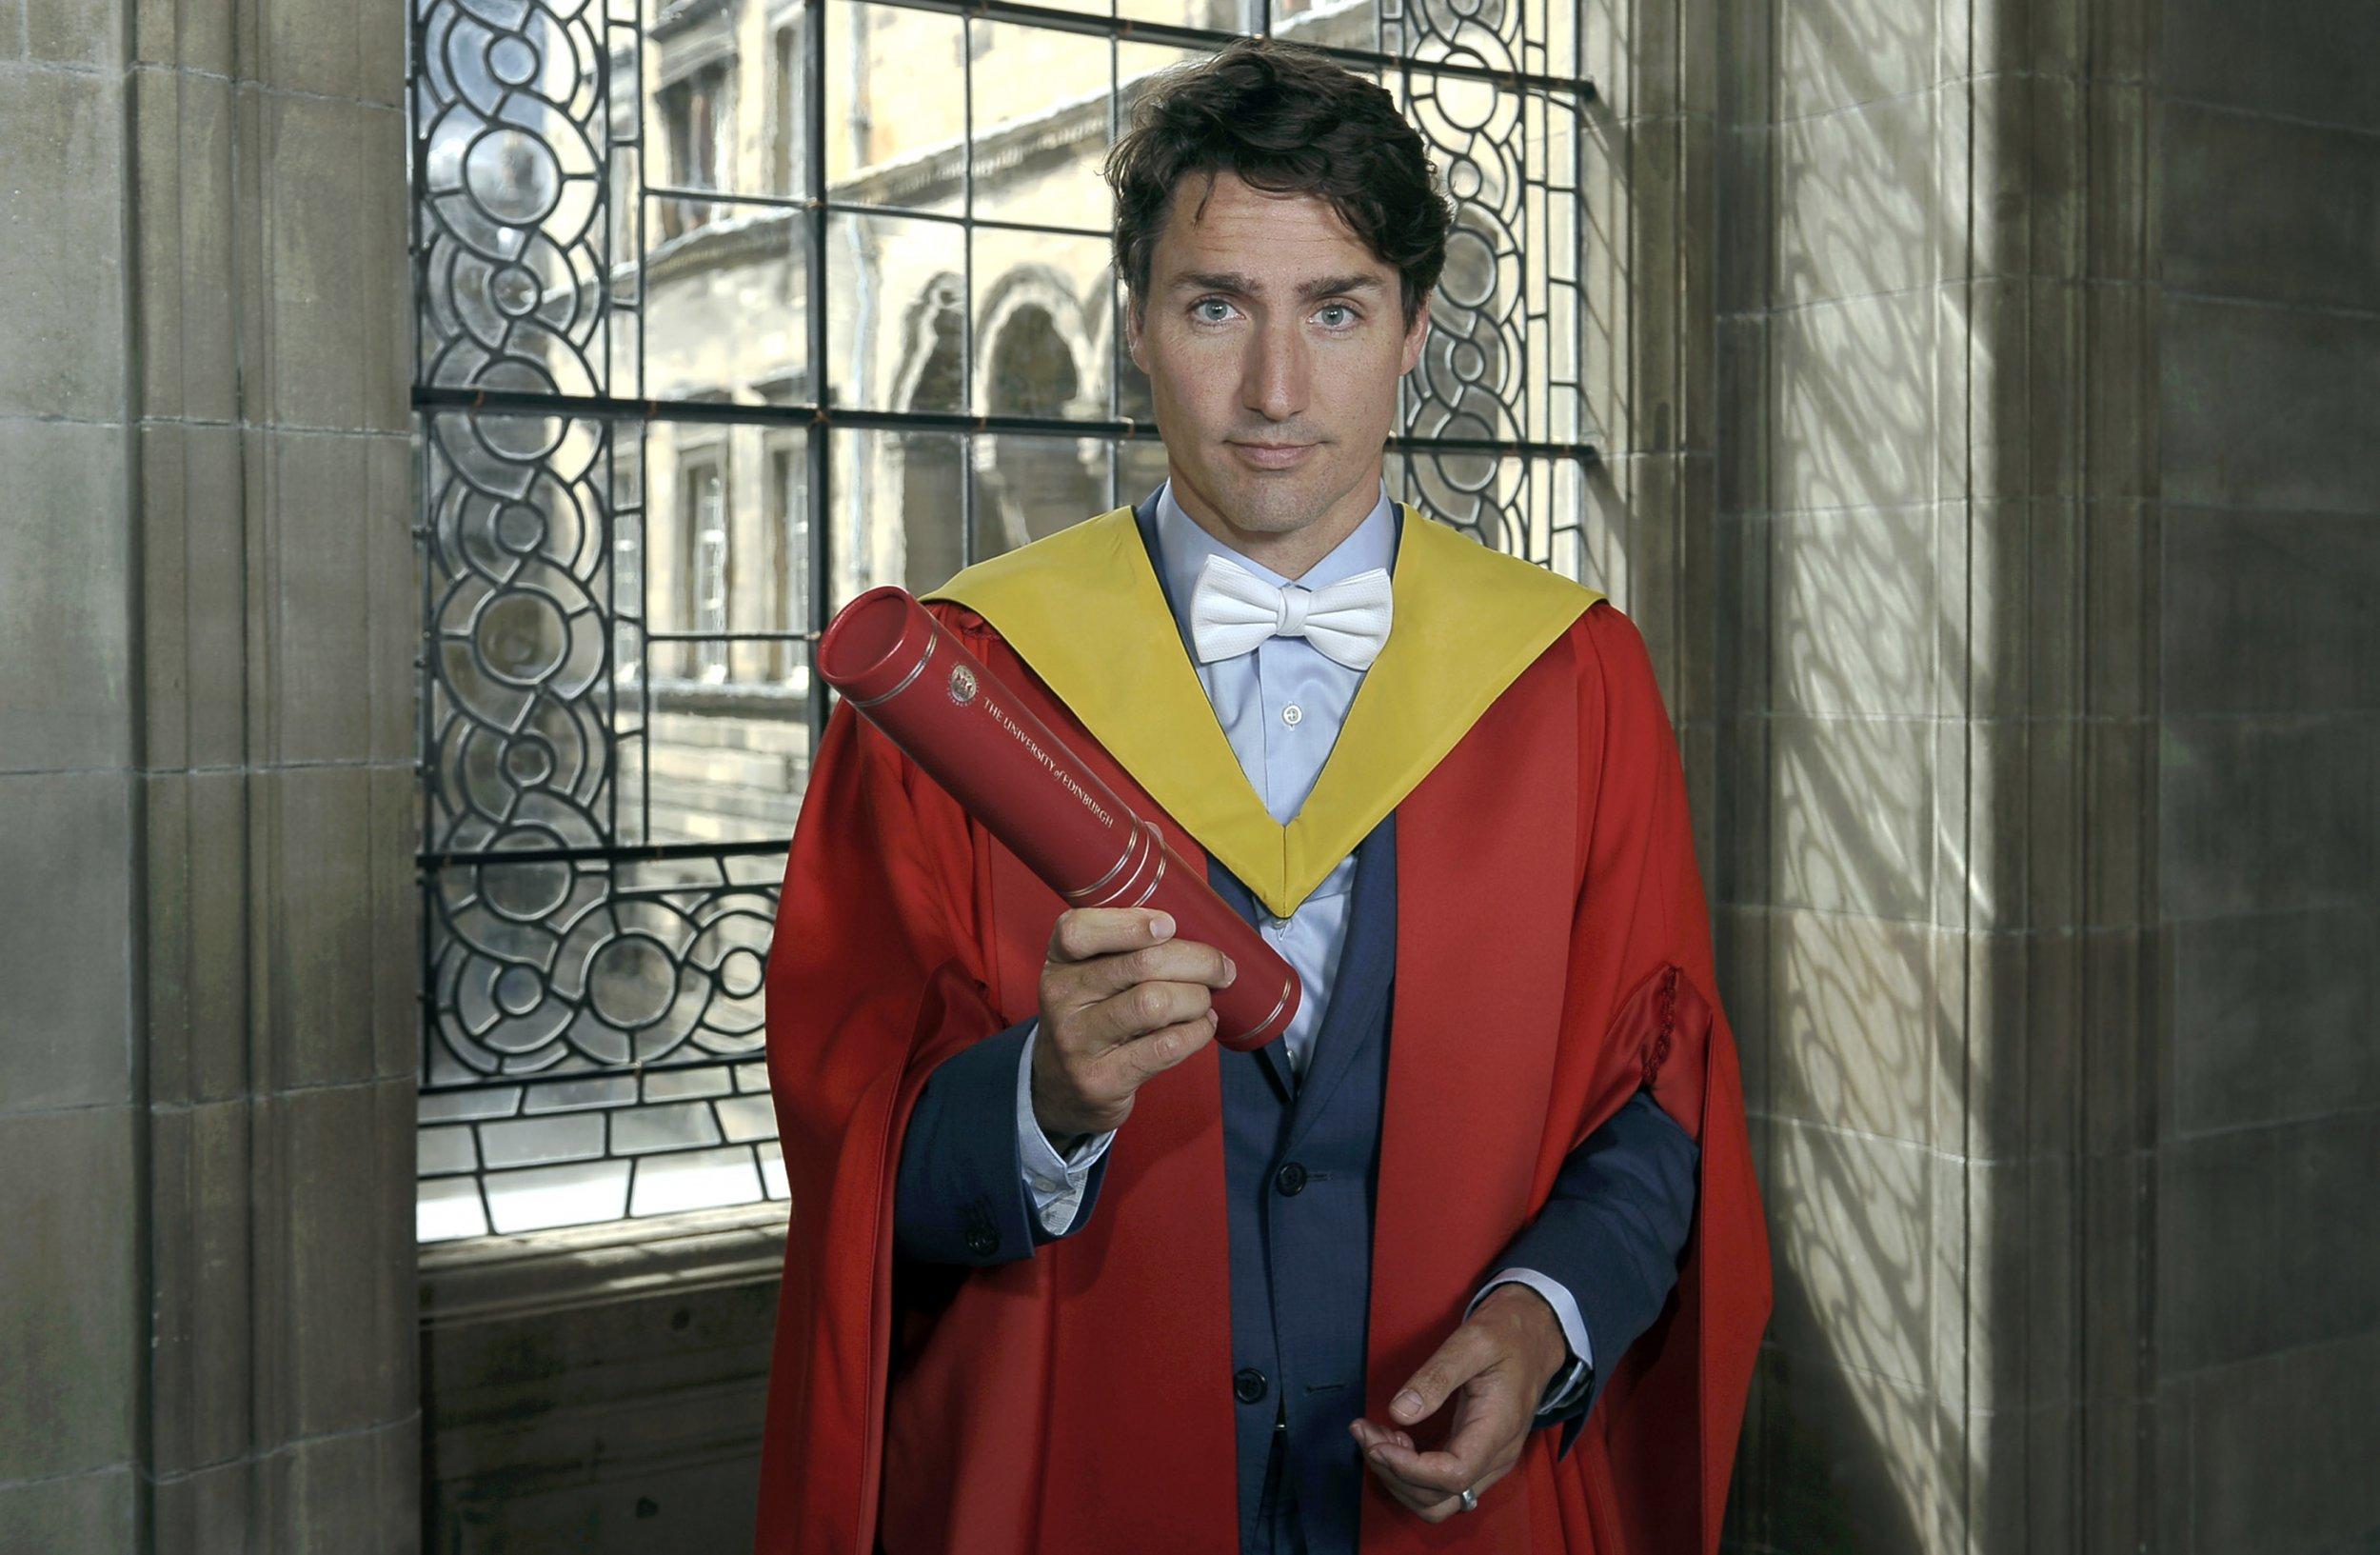 1  academic scottish justin-trudeau-degree.jpg